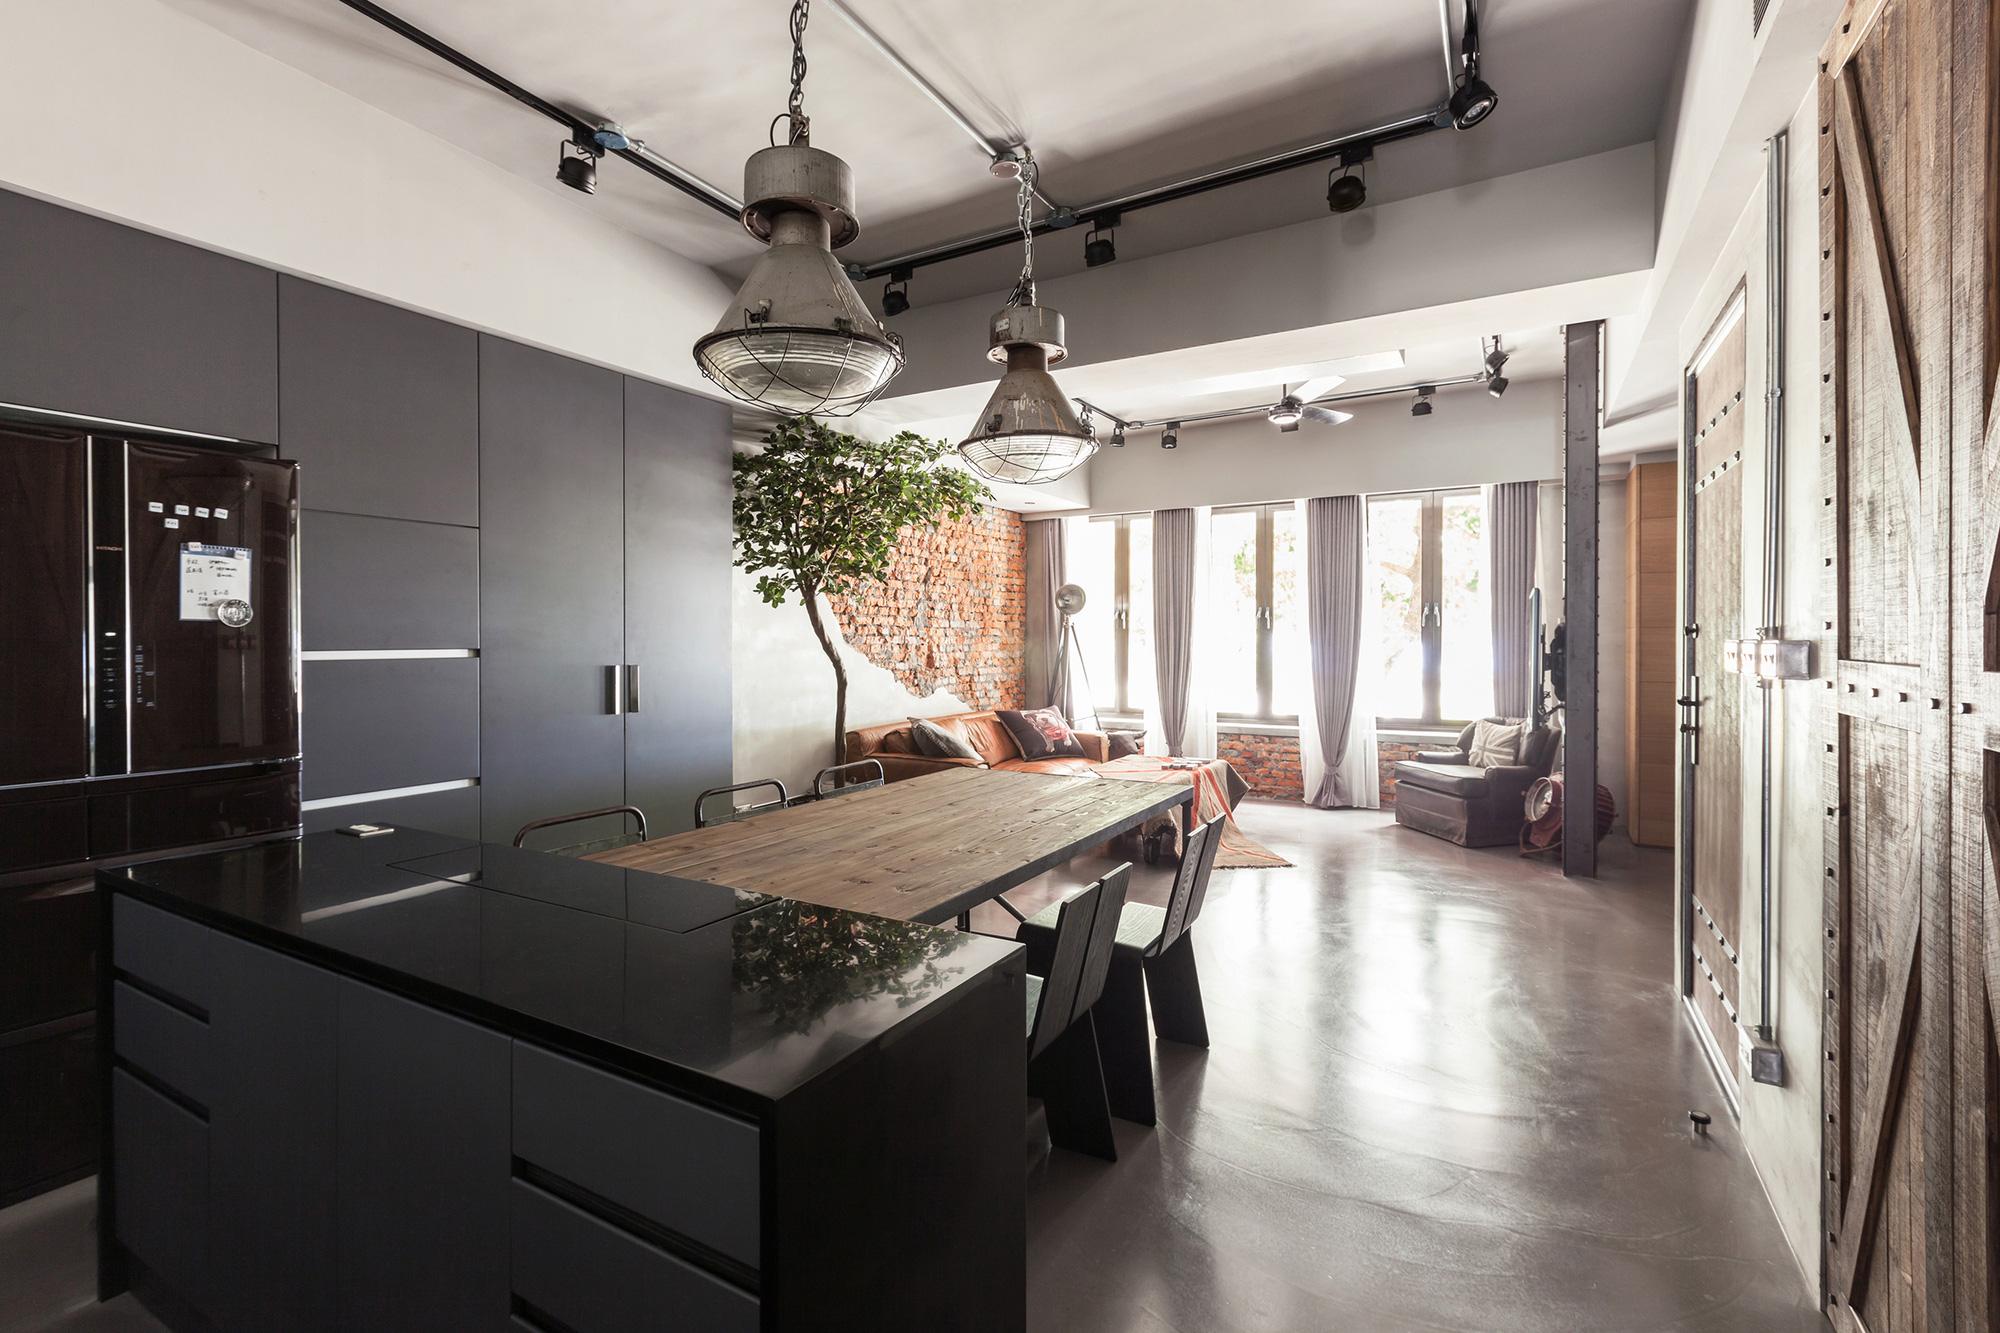 Apartment Refurbishment / CHI-TORCH Interior Design (12)